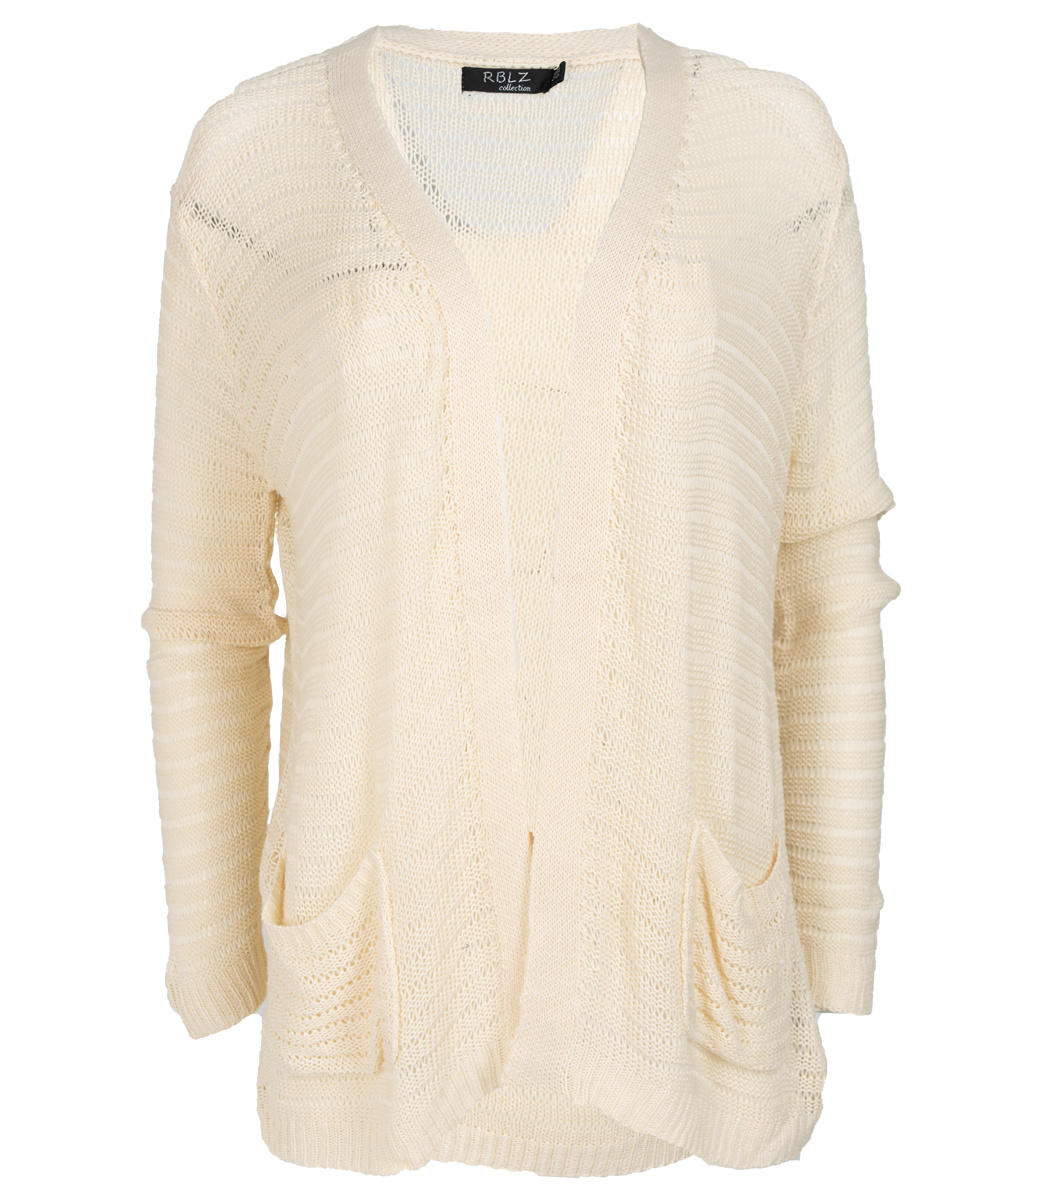 Rebelz Collection Vest beige Trudy